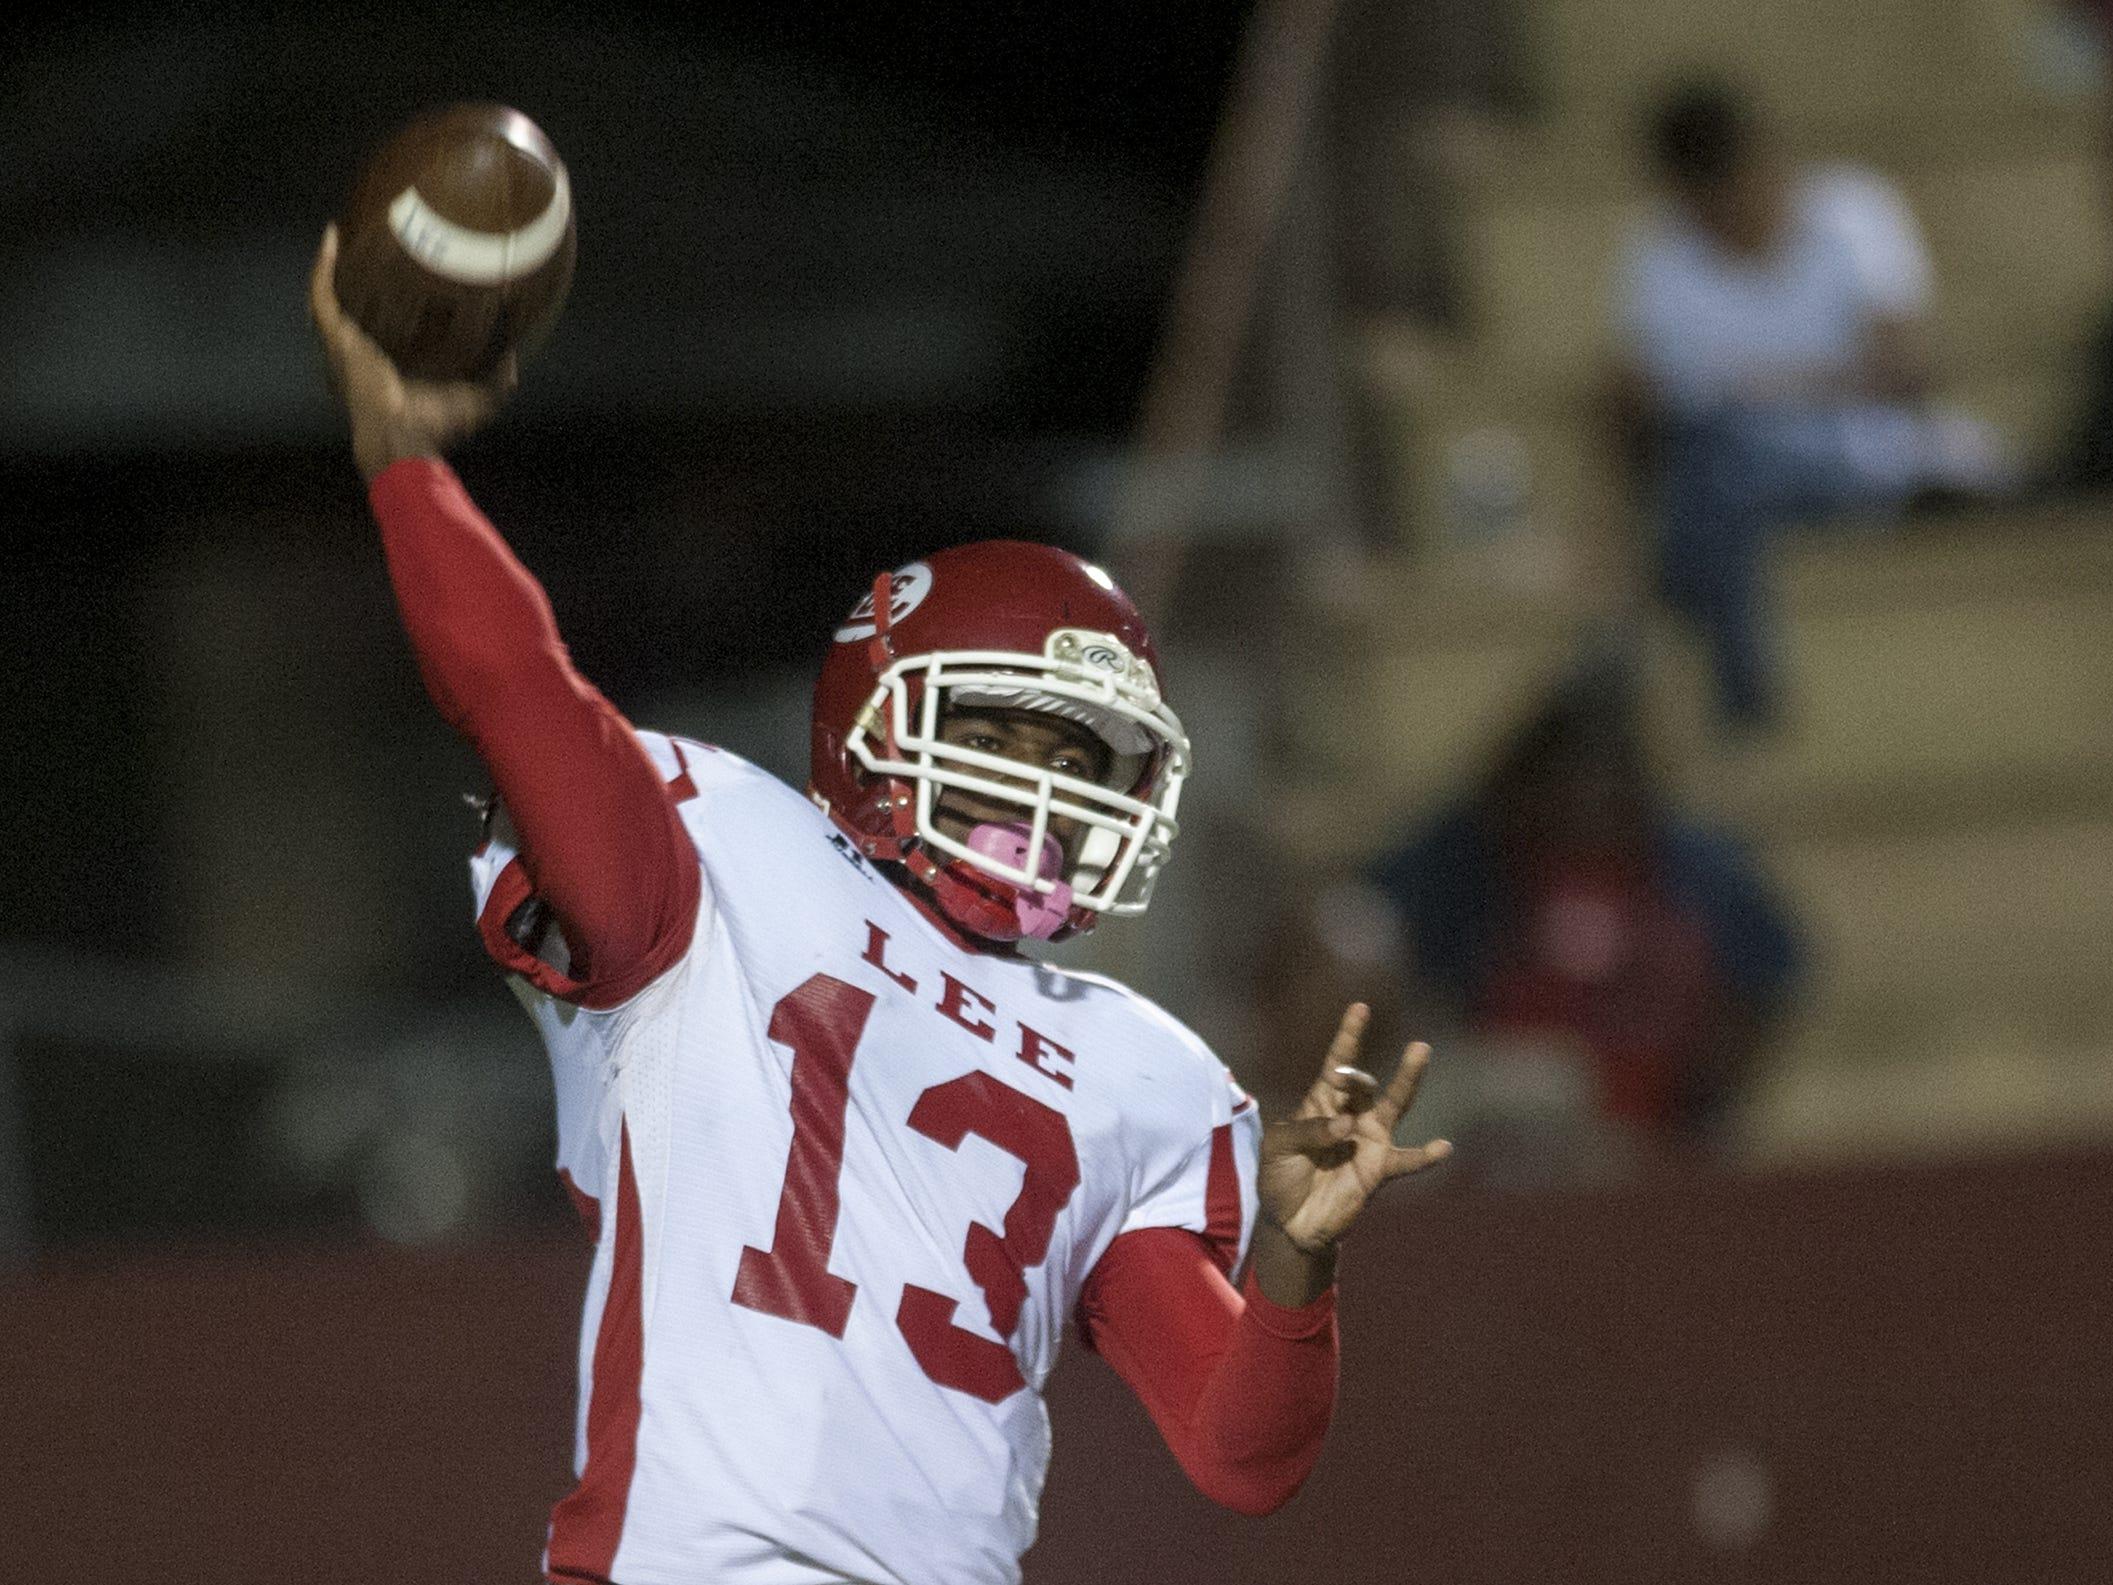 Lee quarterback Shaquille Johnson throws against Prattville at Stanley Jensen Stadium in Prattville, Ala. on Friday October 23, 2015.